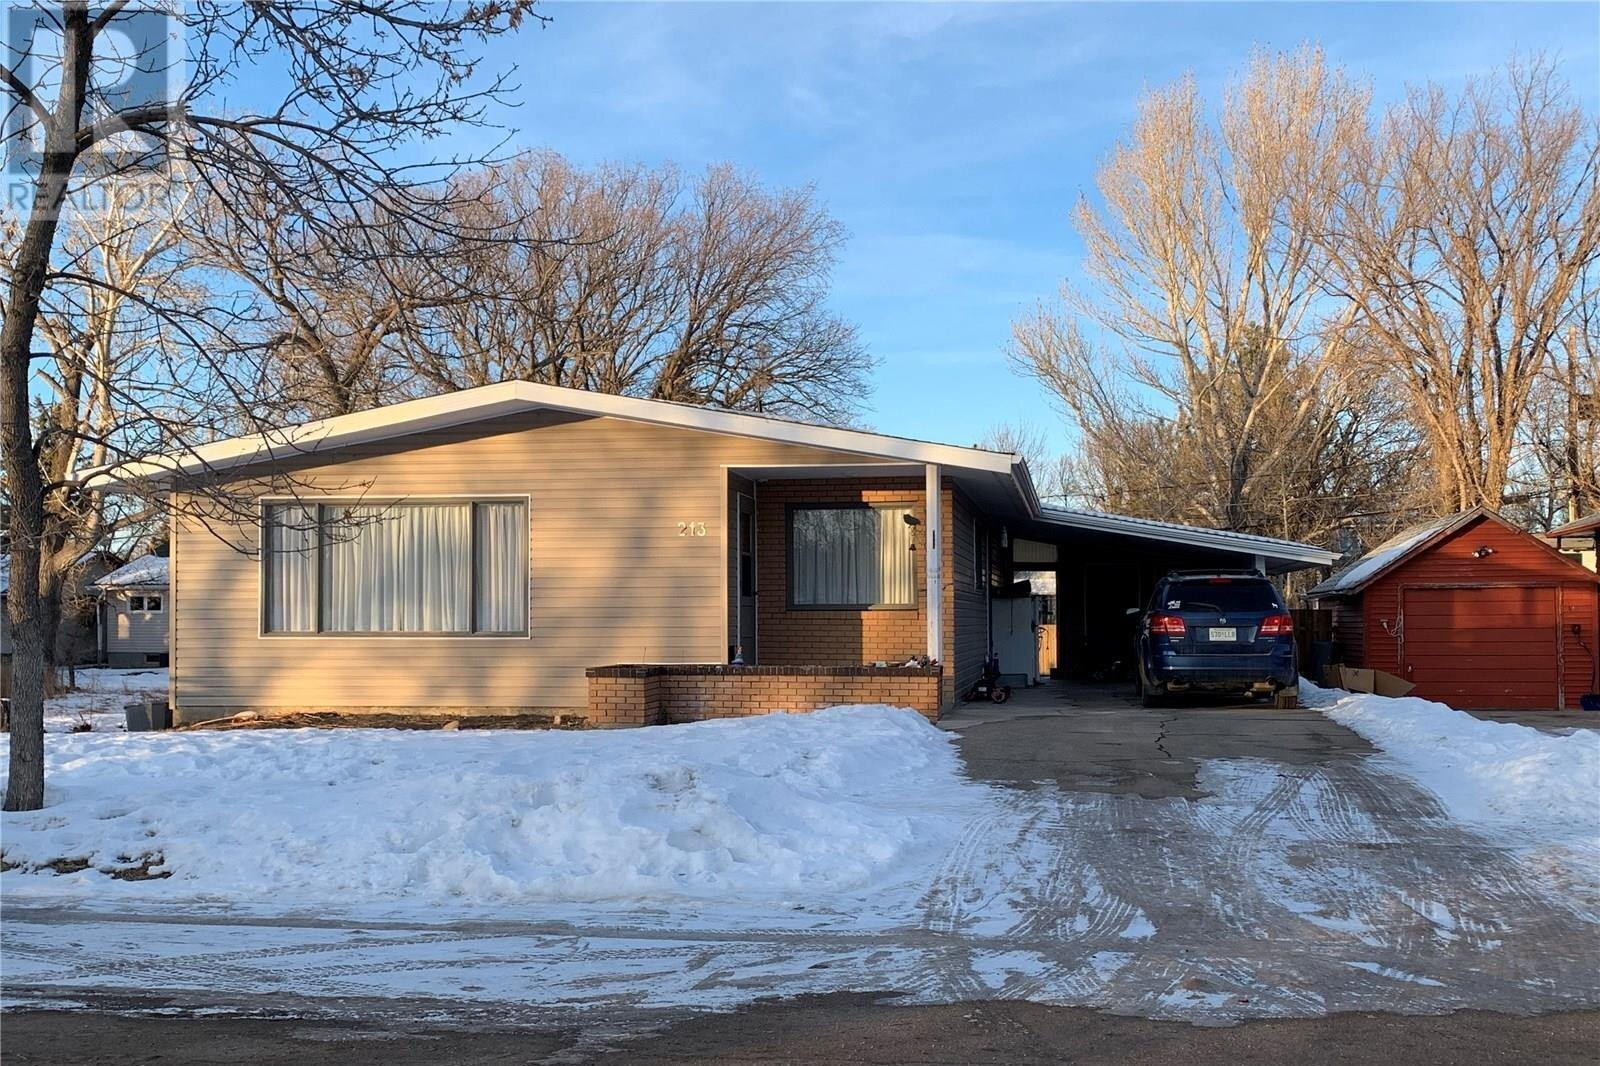 House for sale at 213 7th Ave E Assiniboia Saskatchewan - MLS: SK834820